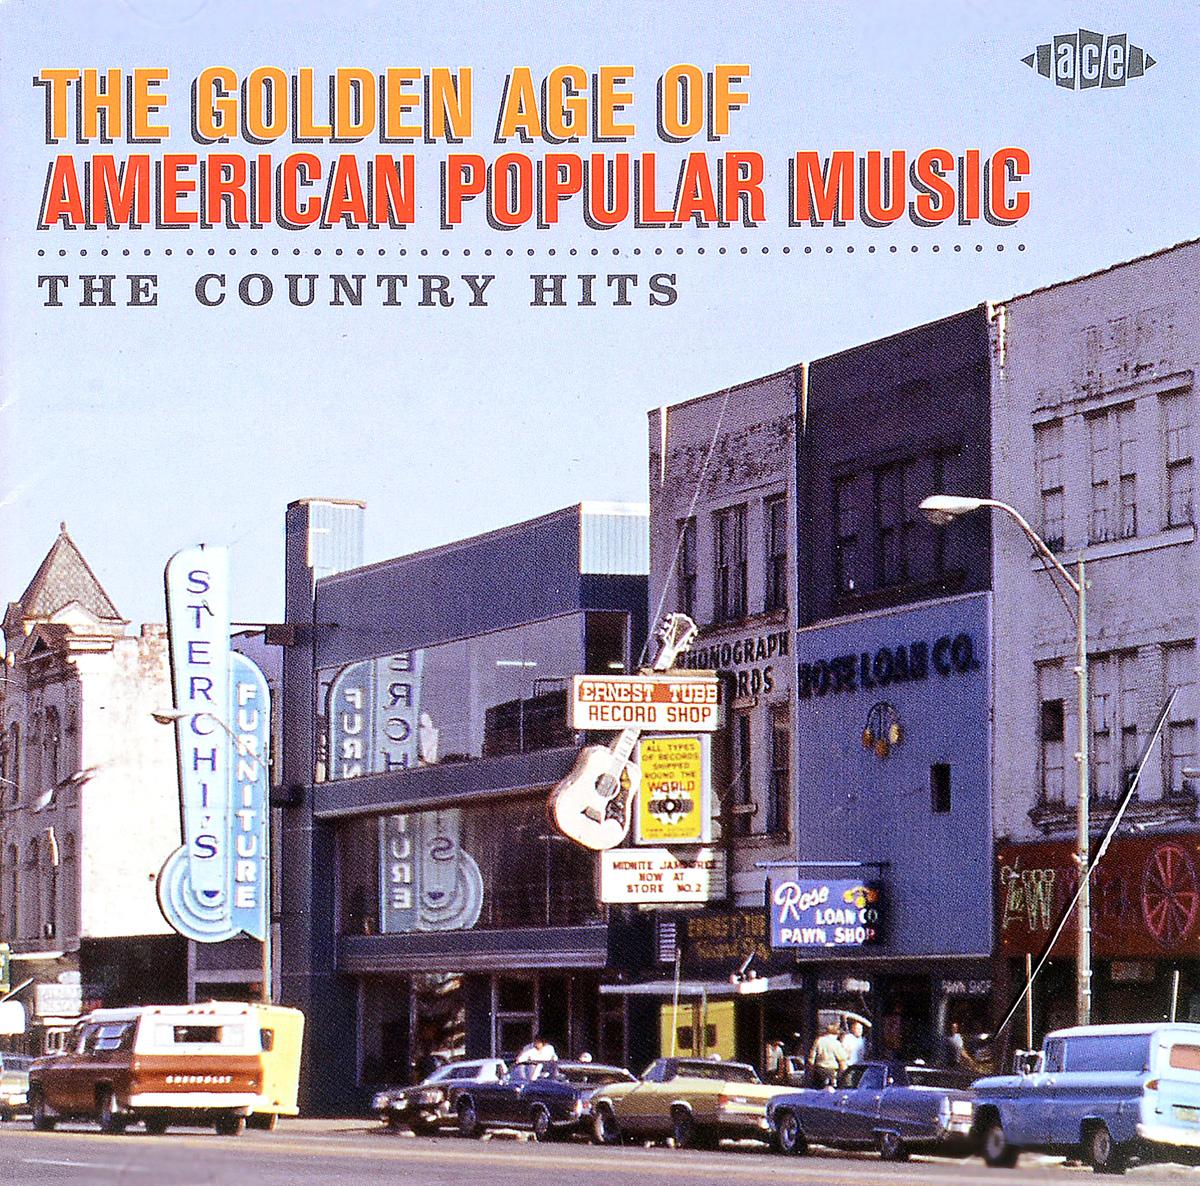 цены на The Golden Age Of American Popular Music - The Country Hits  в интернет-магазинах